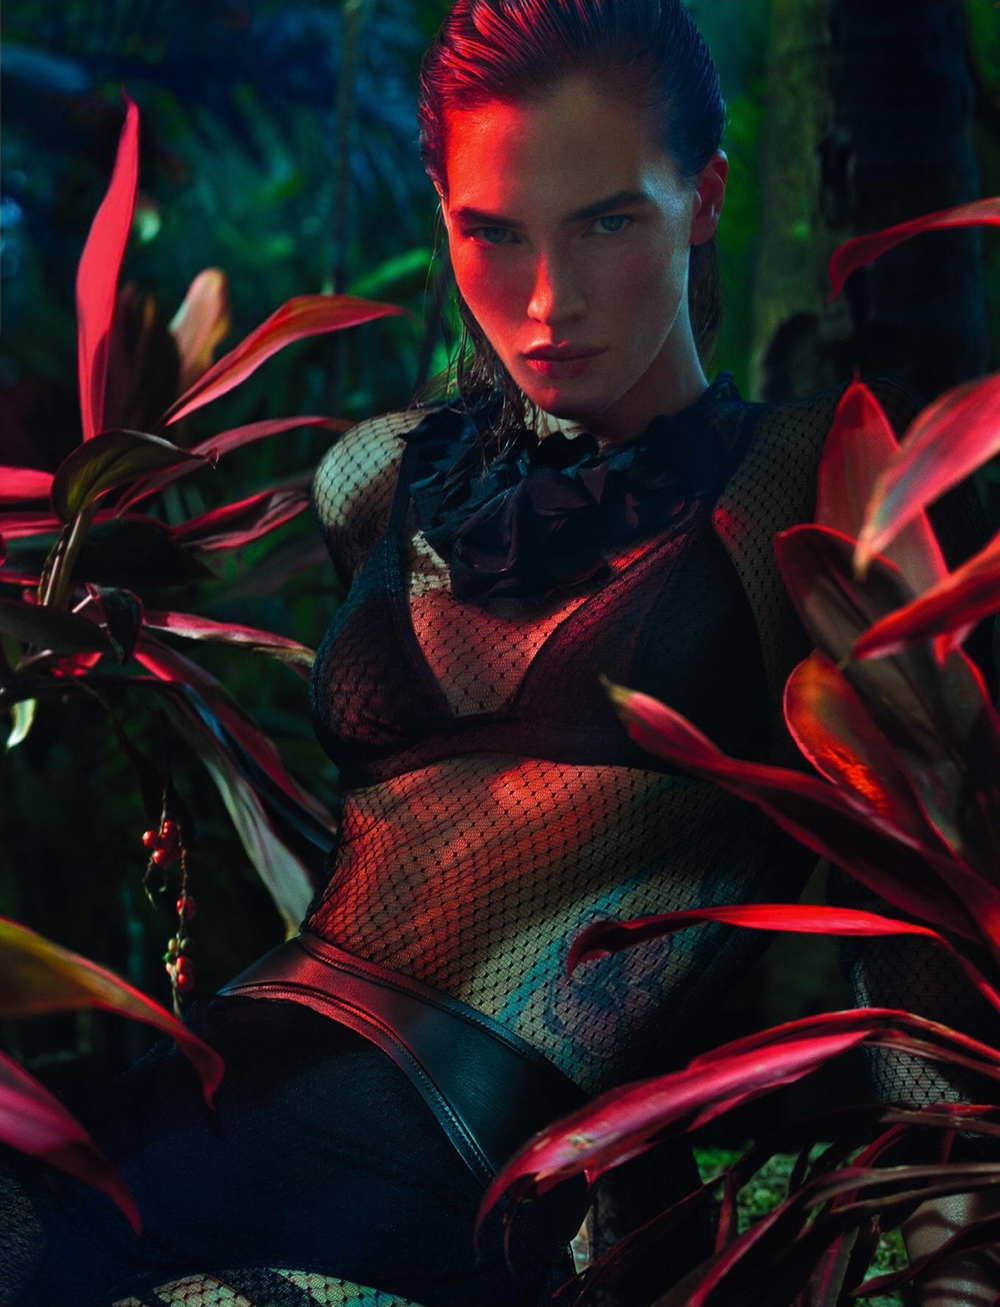 Crista cober numero magazine aug 2015 by txema yeste hq photo shoot nudes (31 photos), Instagram Celebrites photo